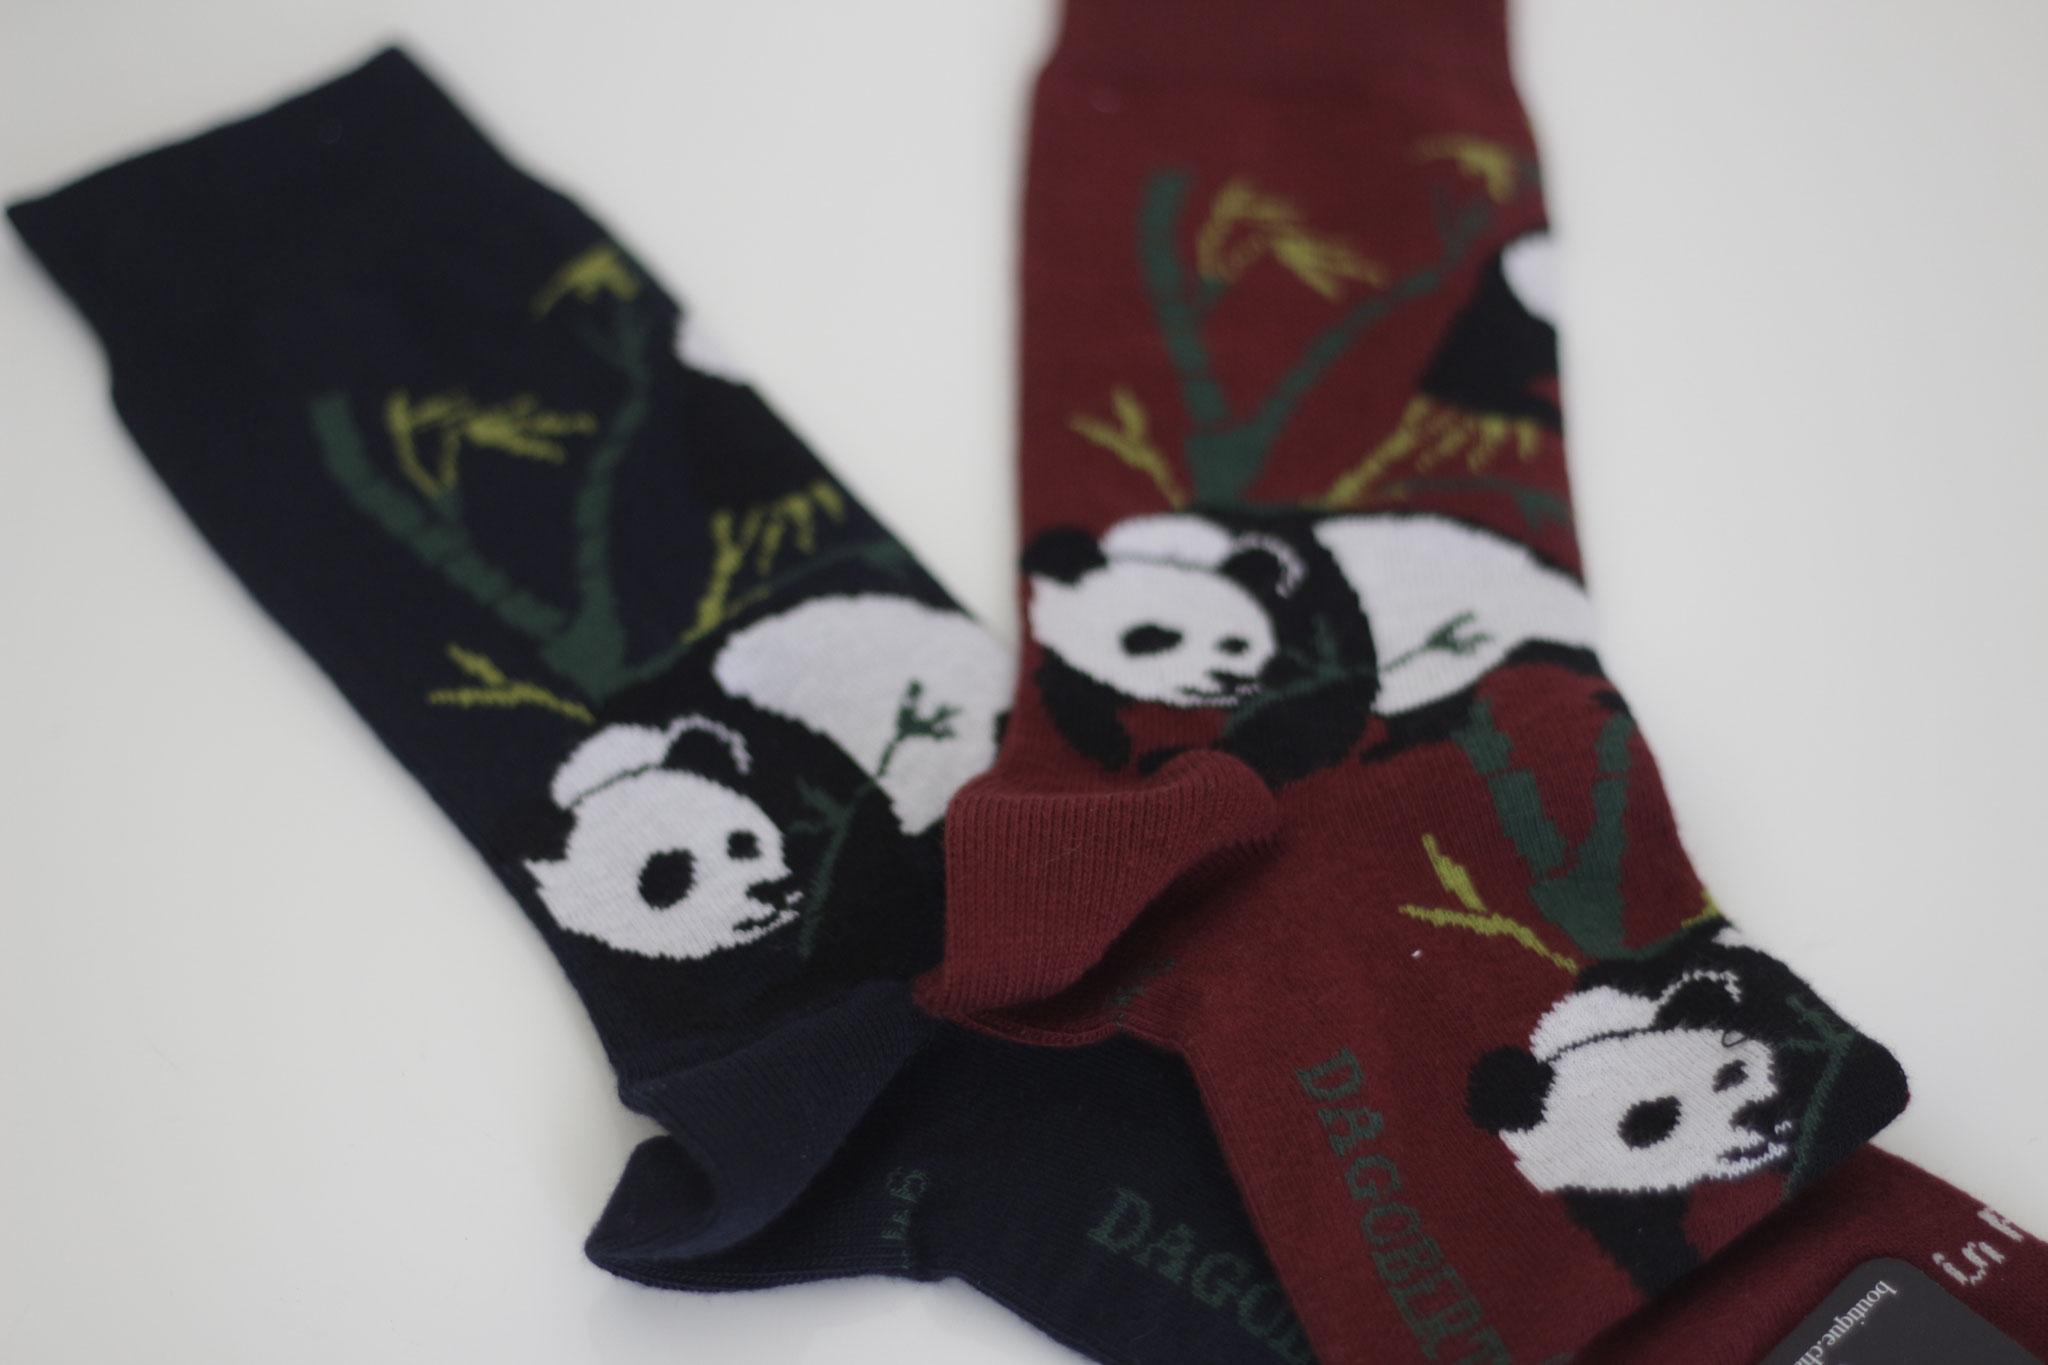 neu eingetroffen Dagobert mit dem Panda (CHF 26.-)